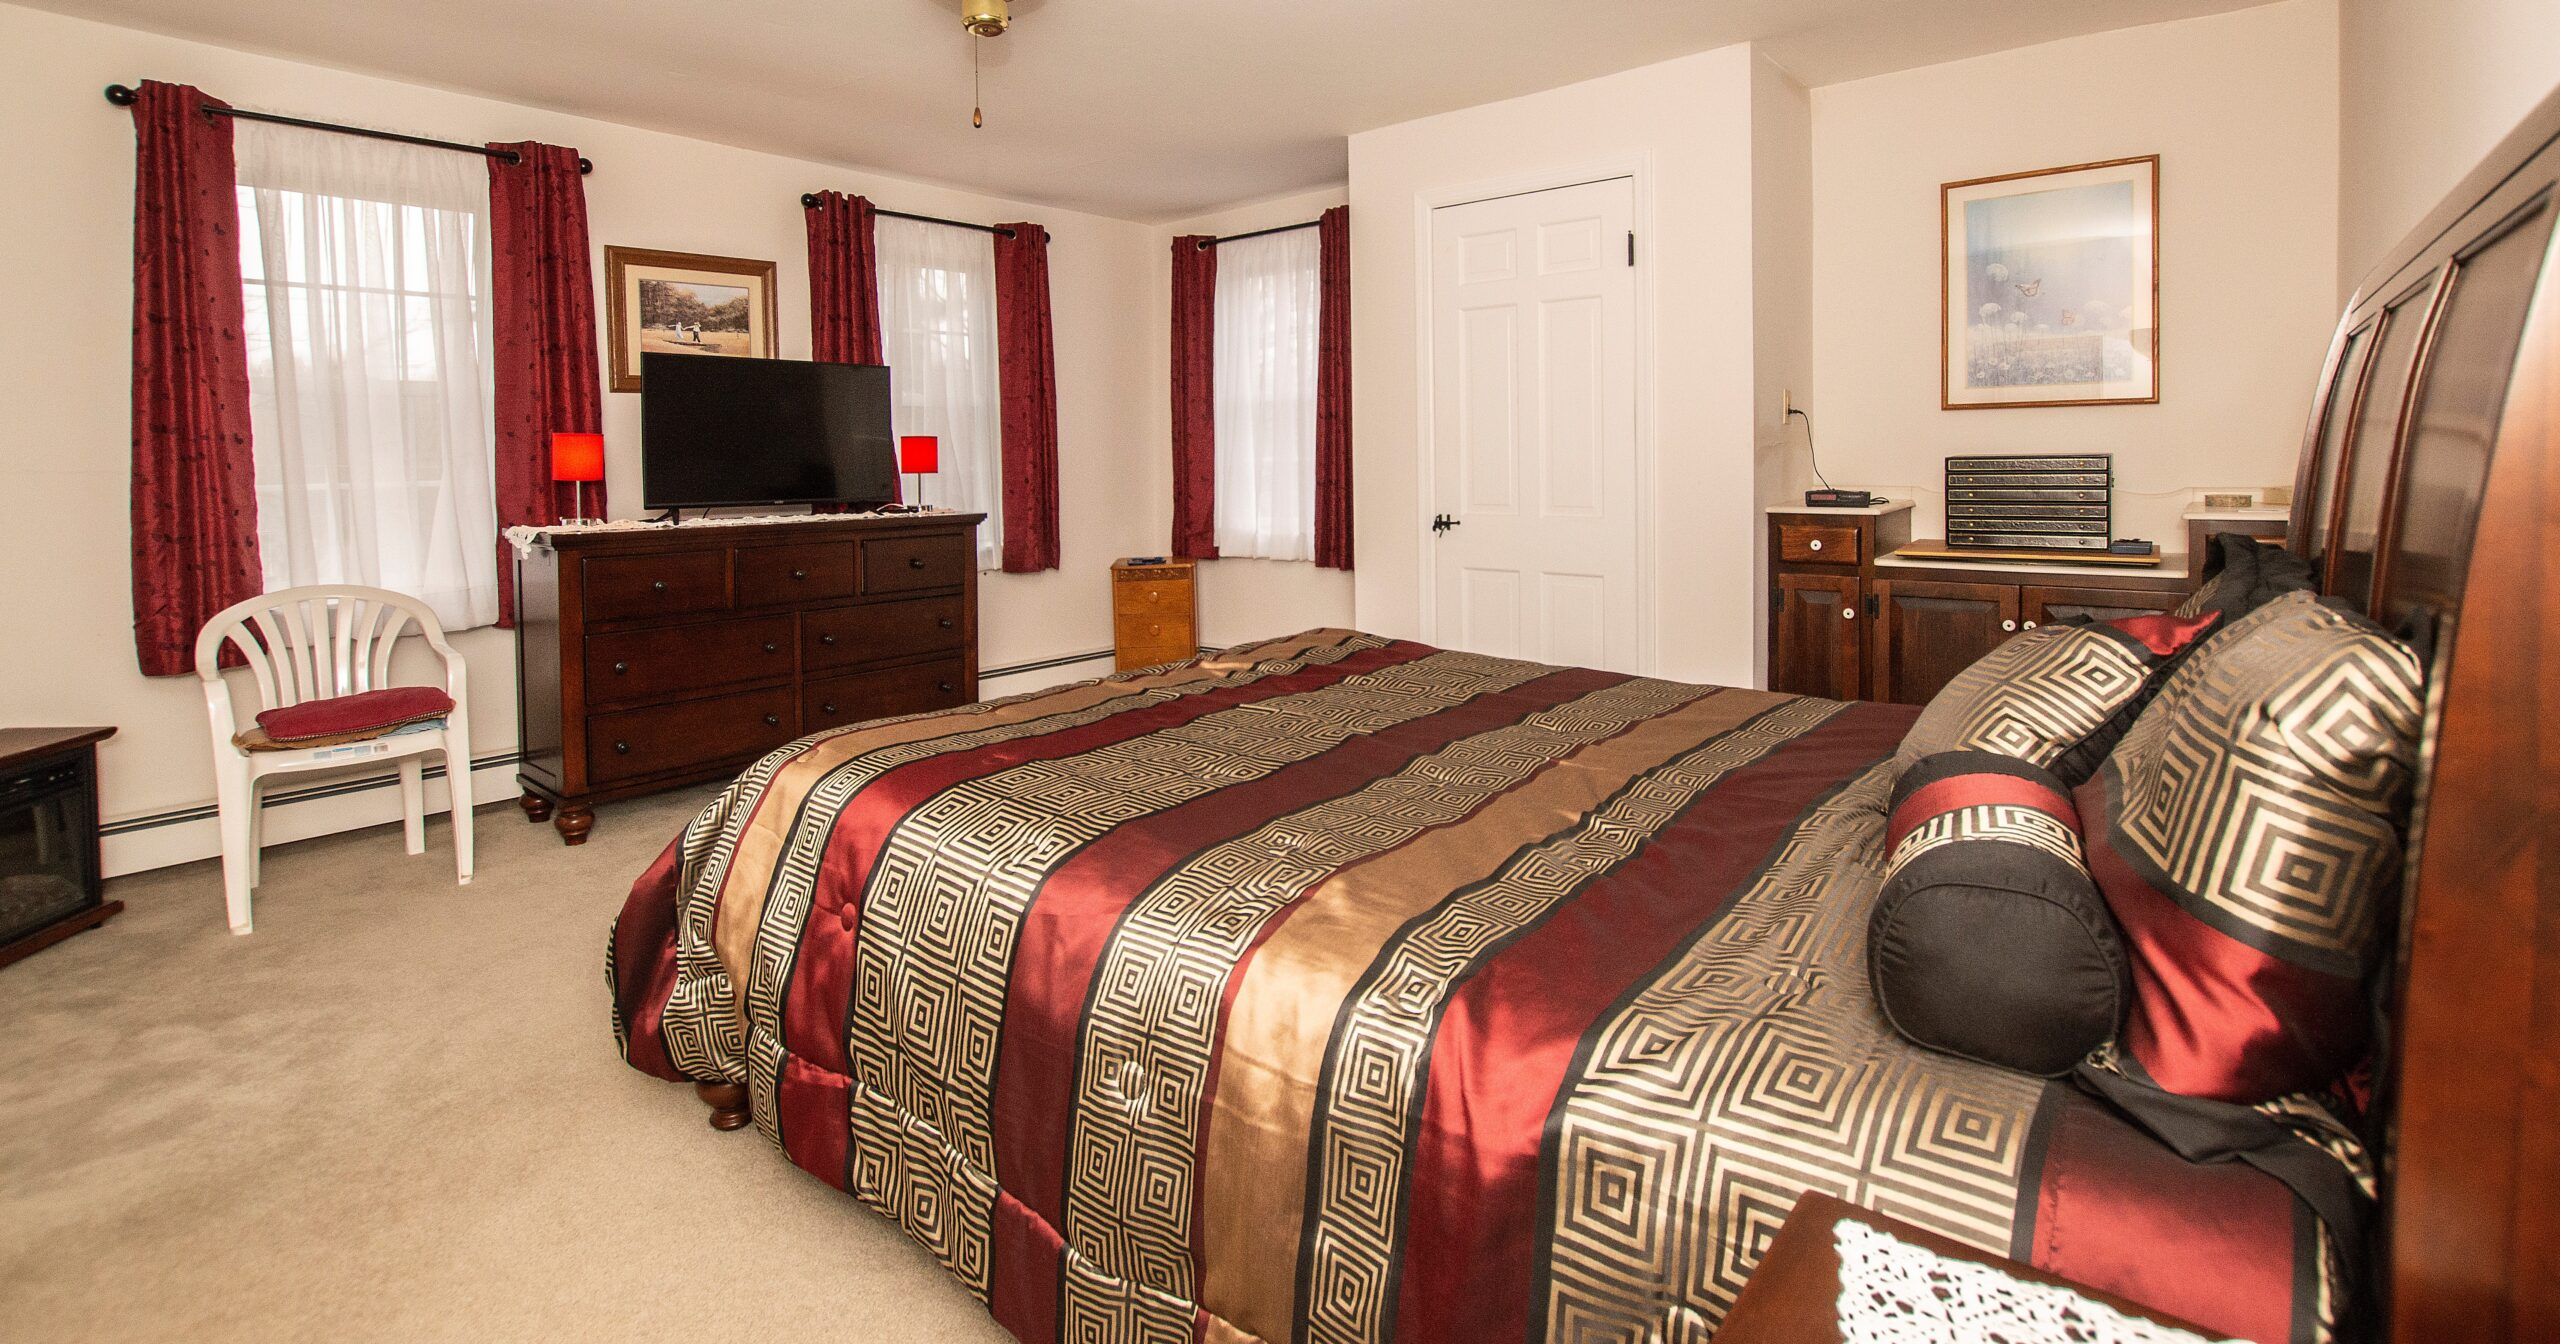 16 HOUSE BDRM 3B 5993